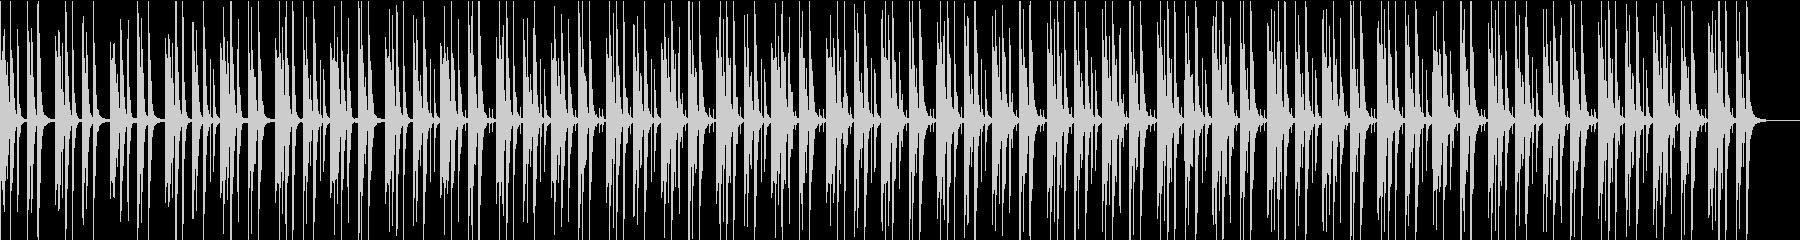 youtube・料理・ピアノ&ピチカートの未再生の波形